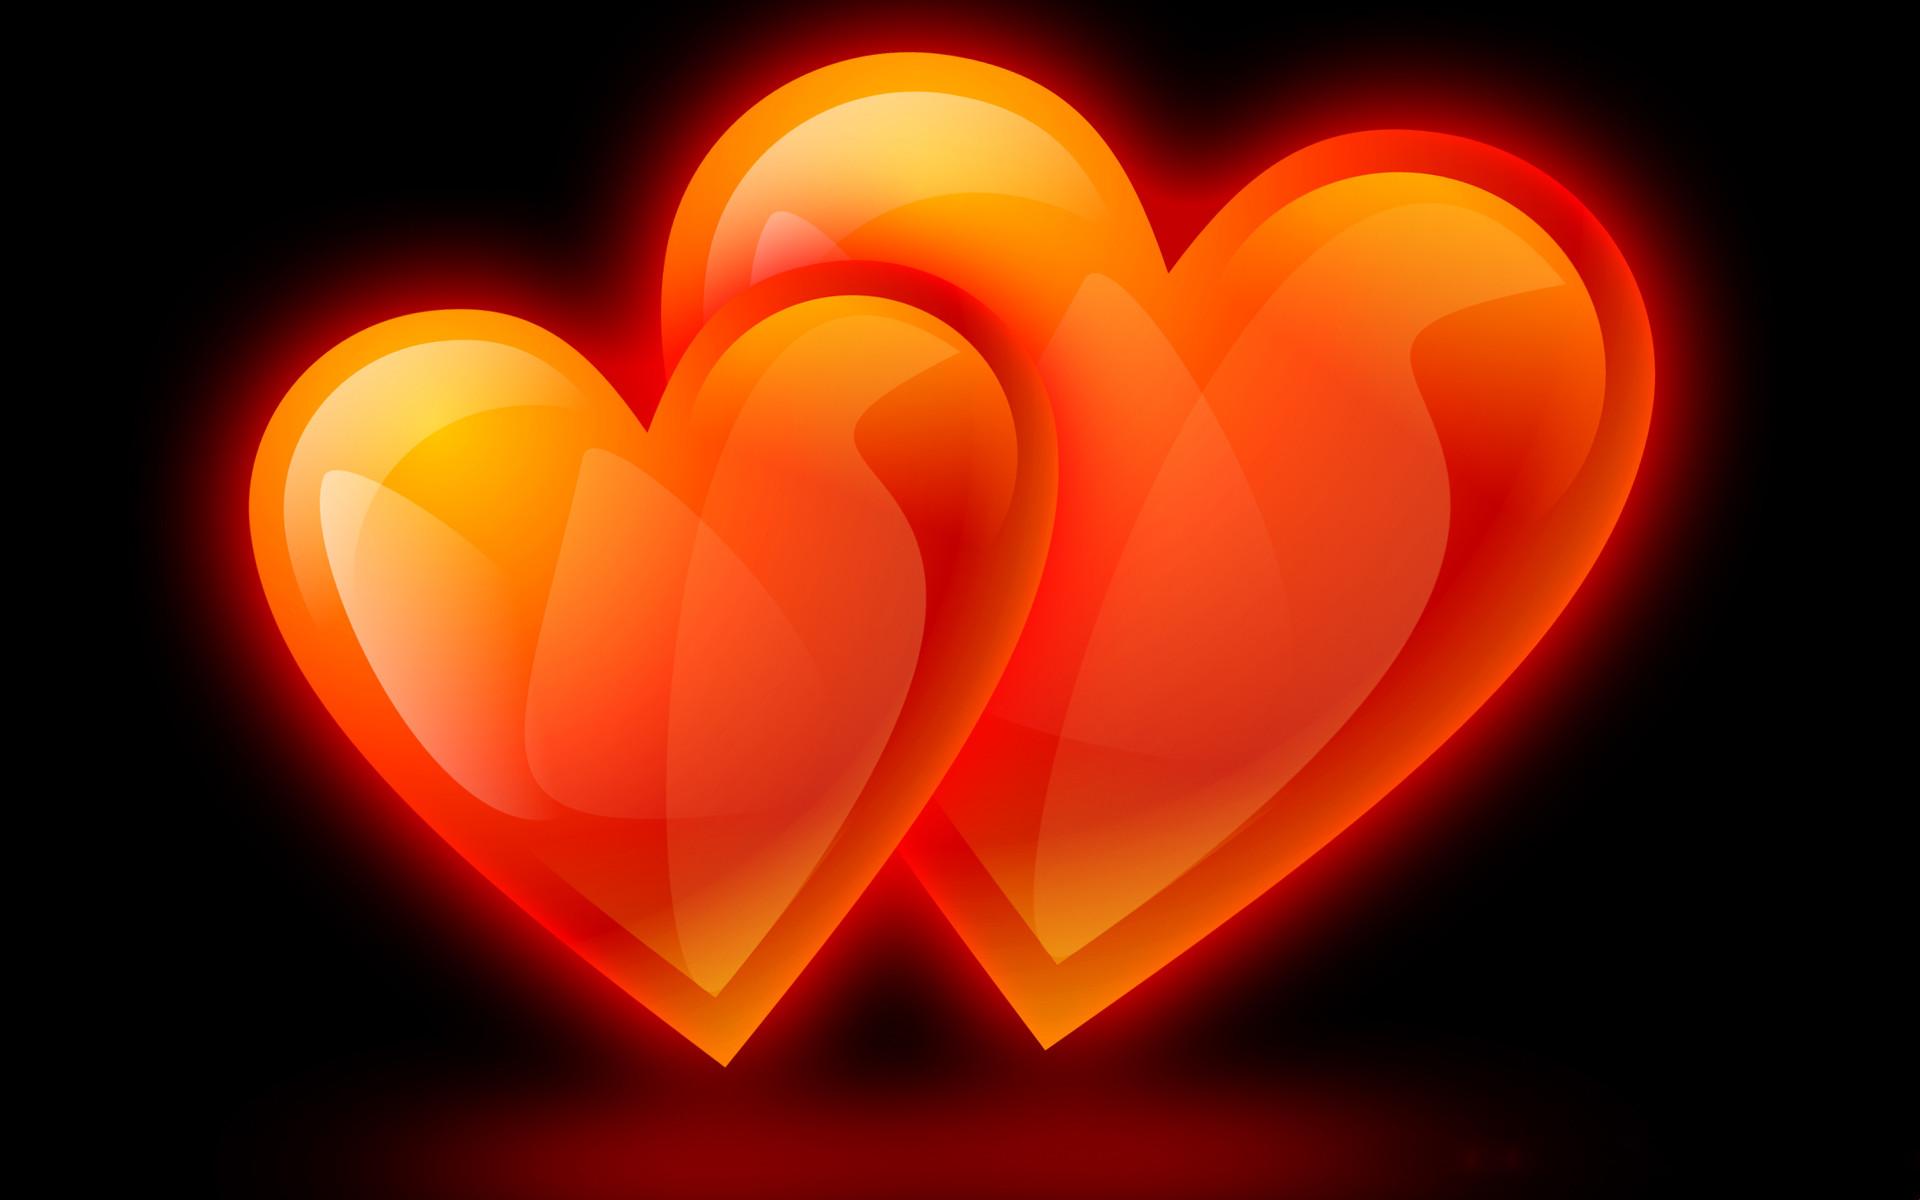 Orange & Black Hearts